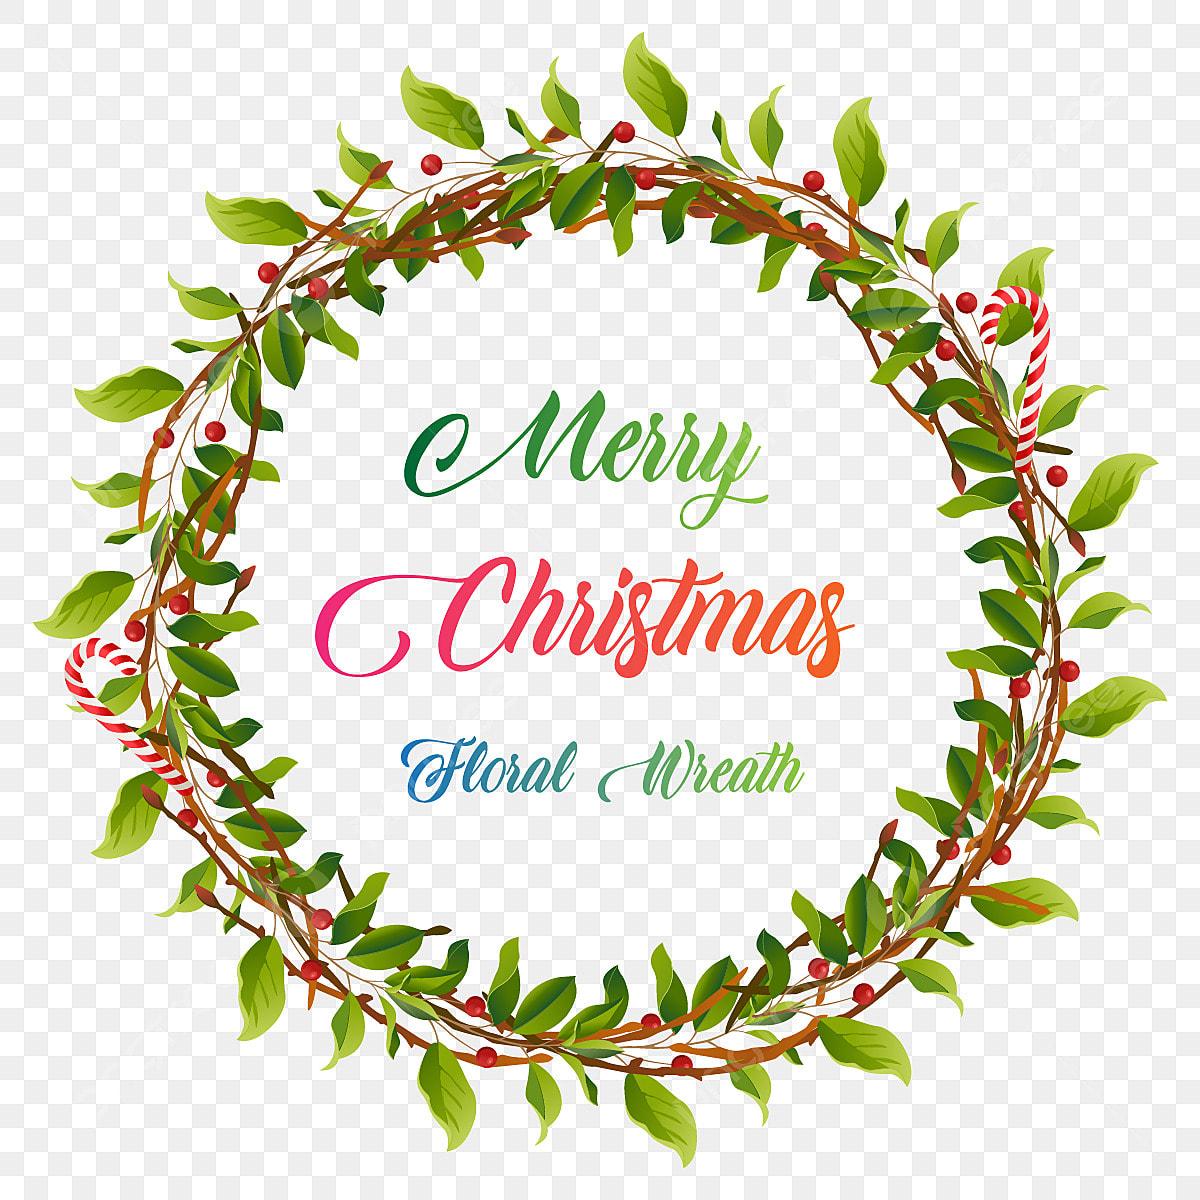 pngtree decorative merry christmas vintage floral wreath illustration png image 3683080